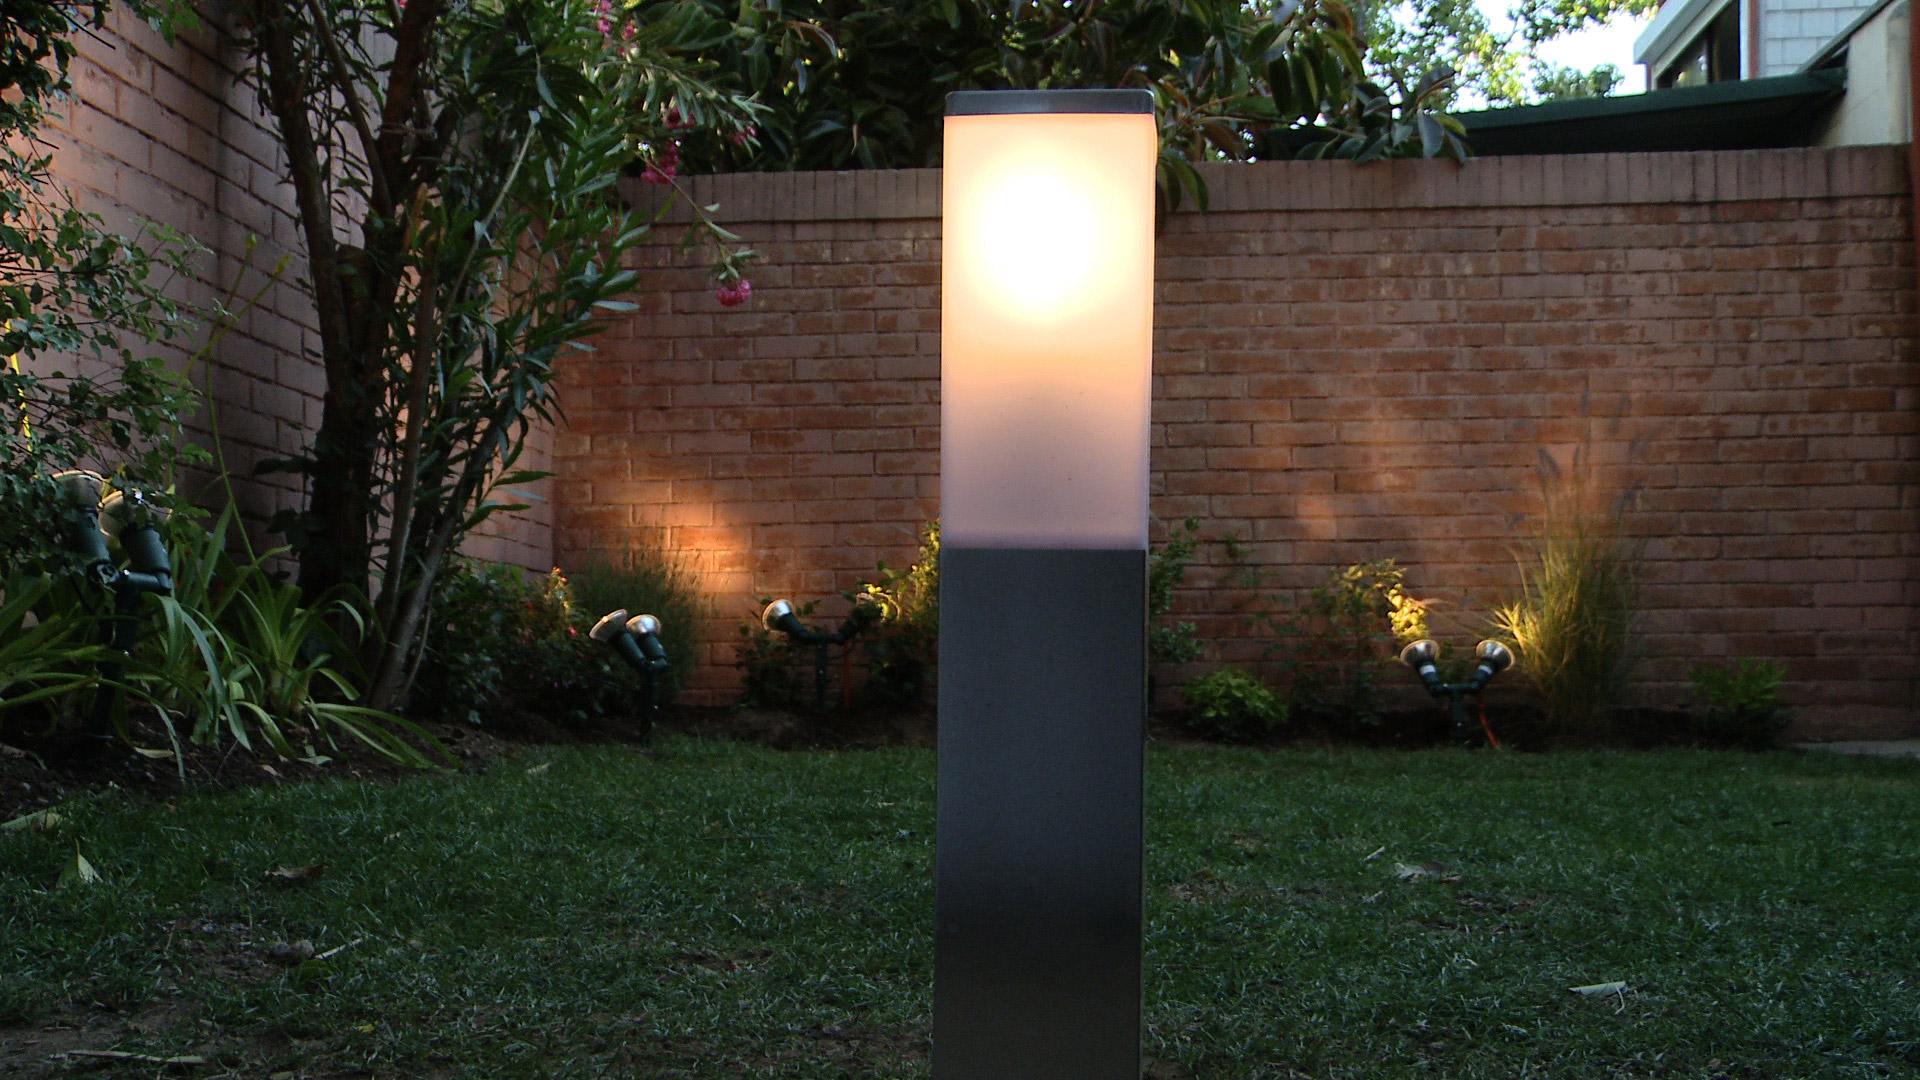 H galo usted mismo c mo instalar luces en el jard n for Luces jardin